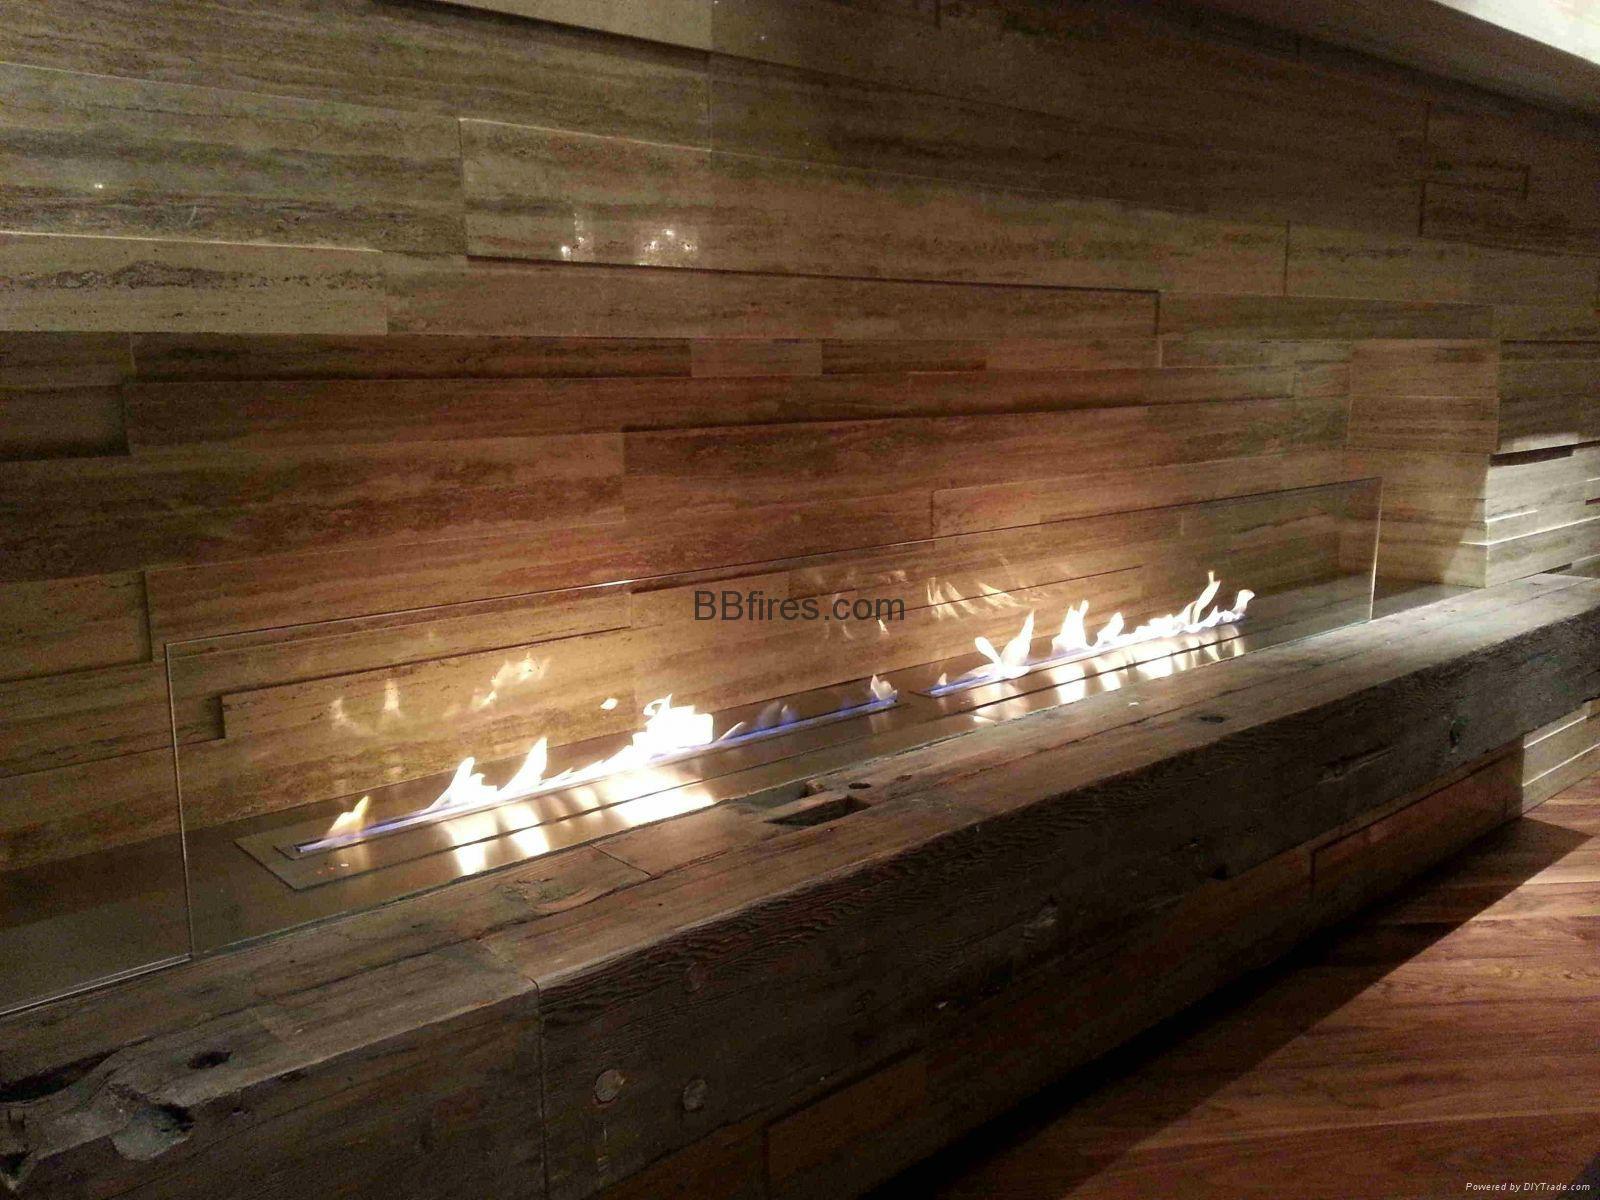 BB bio-ethanol intelligent low heat fireplaces in Star Hotel